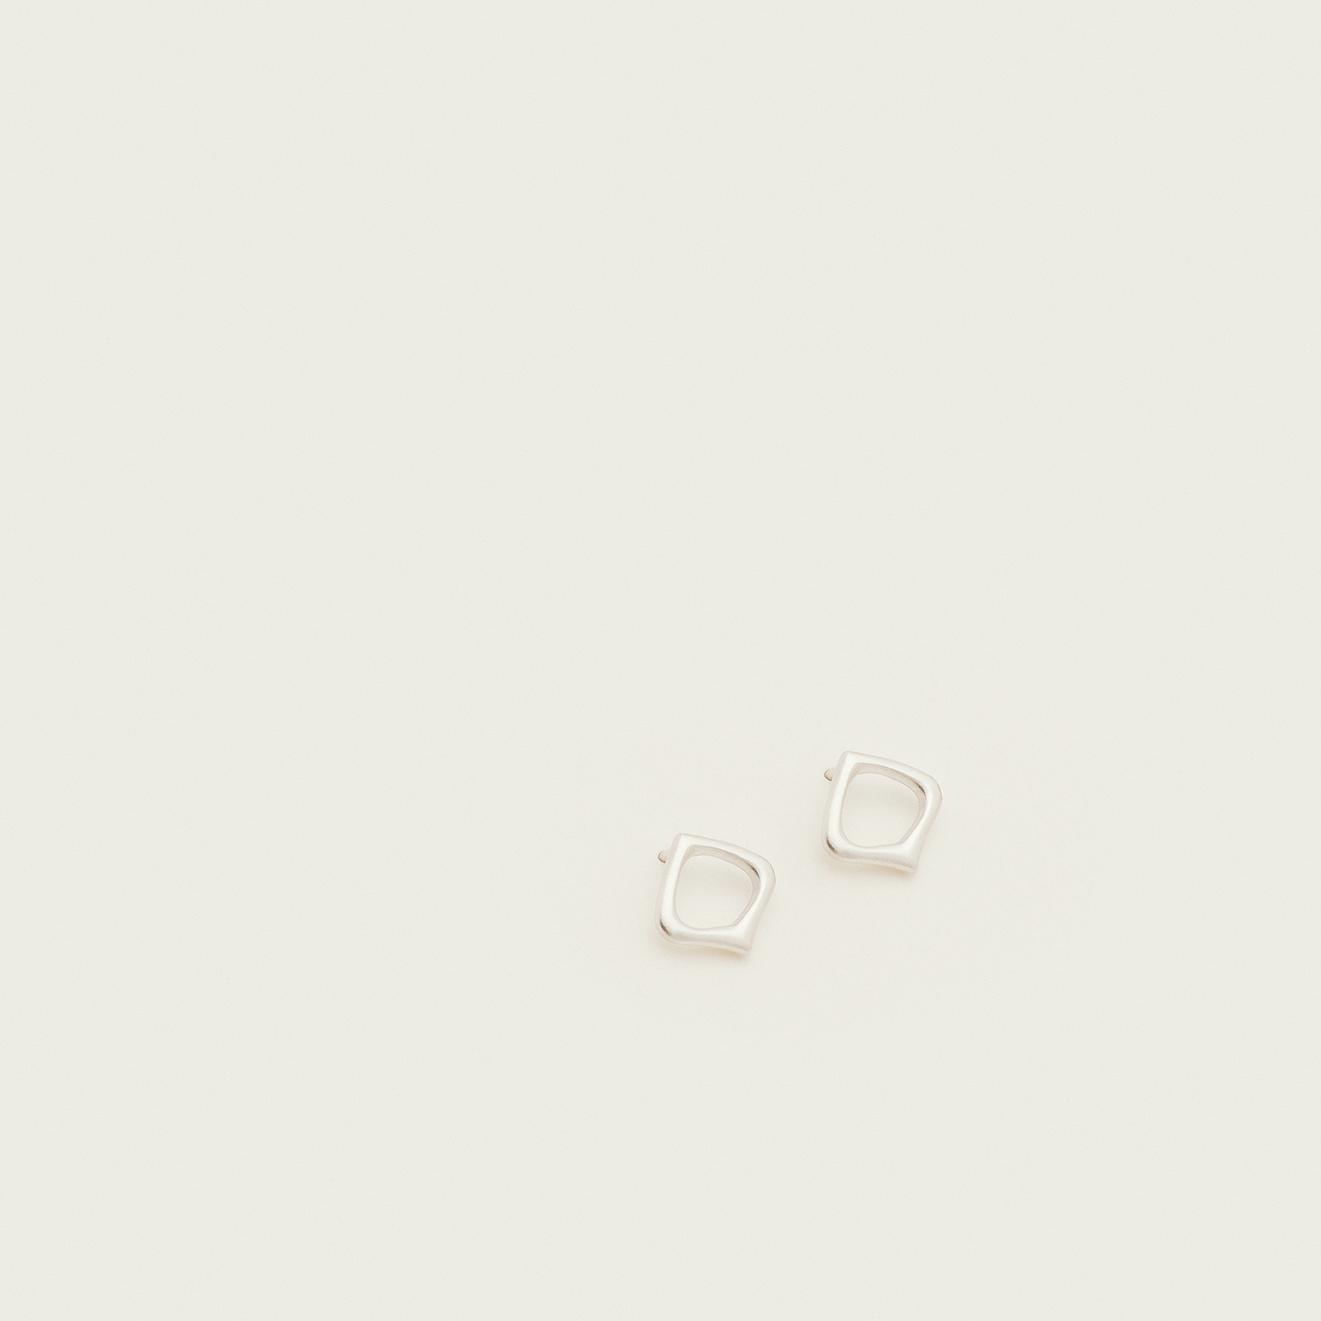 Moznabi Jewellery – Essence of Persia – Silver Studs